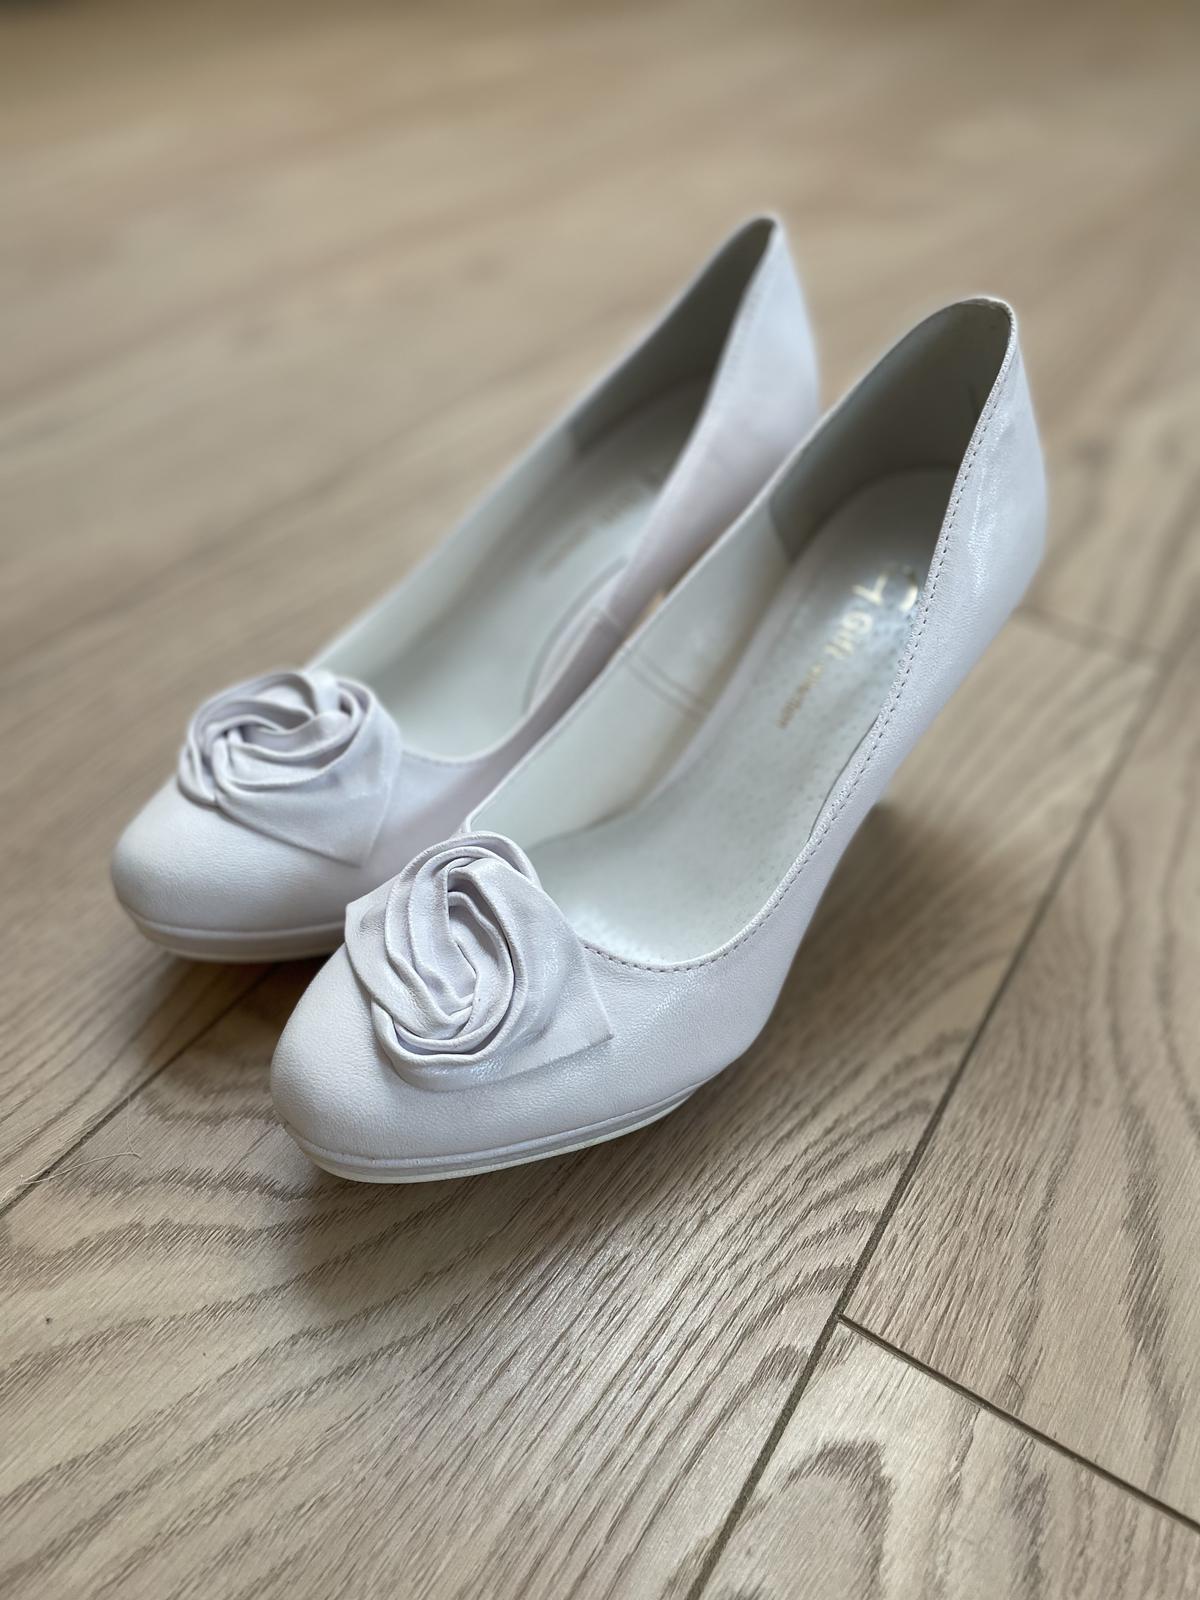 Svadobné topánky veľ 38 - Obrázok č. 1